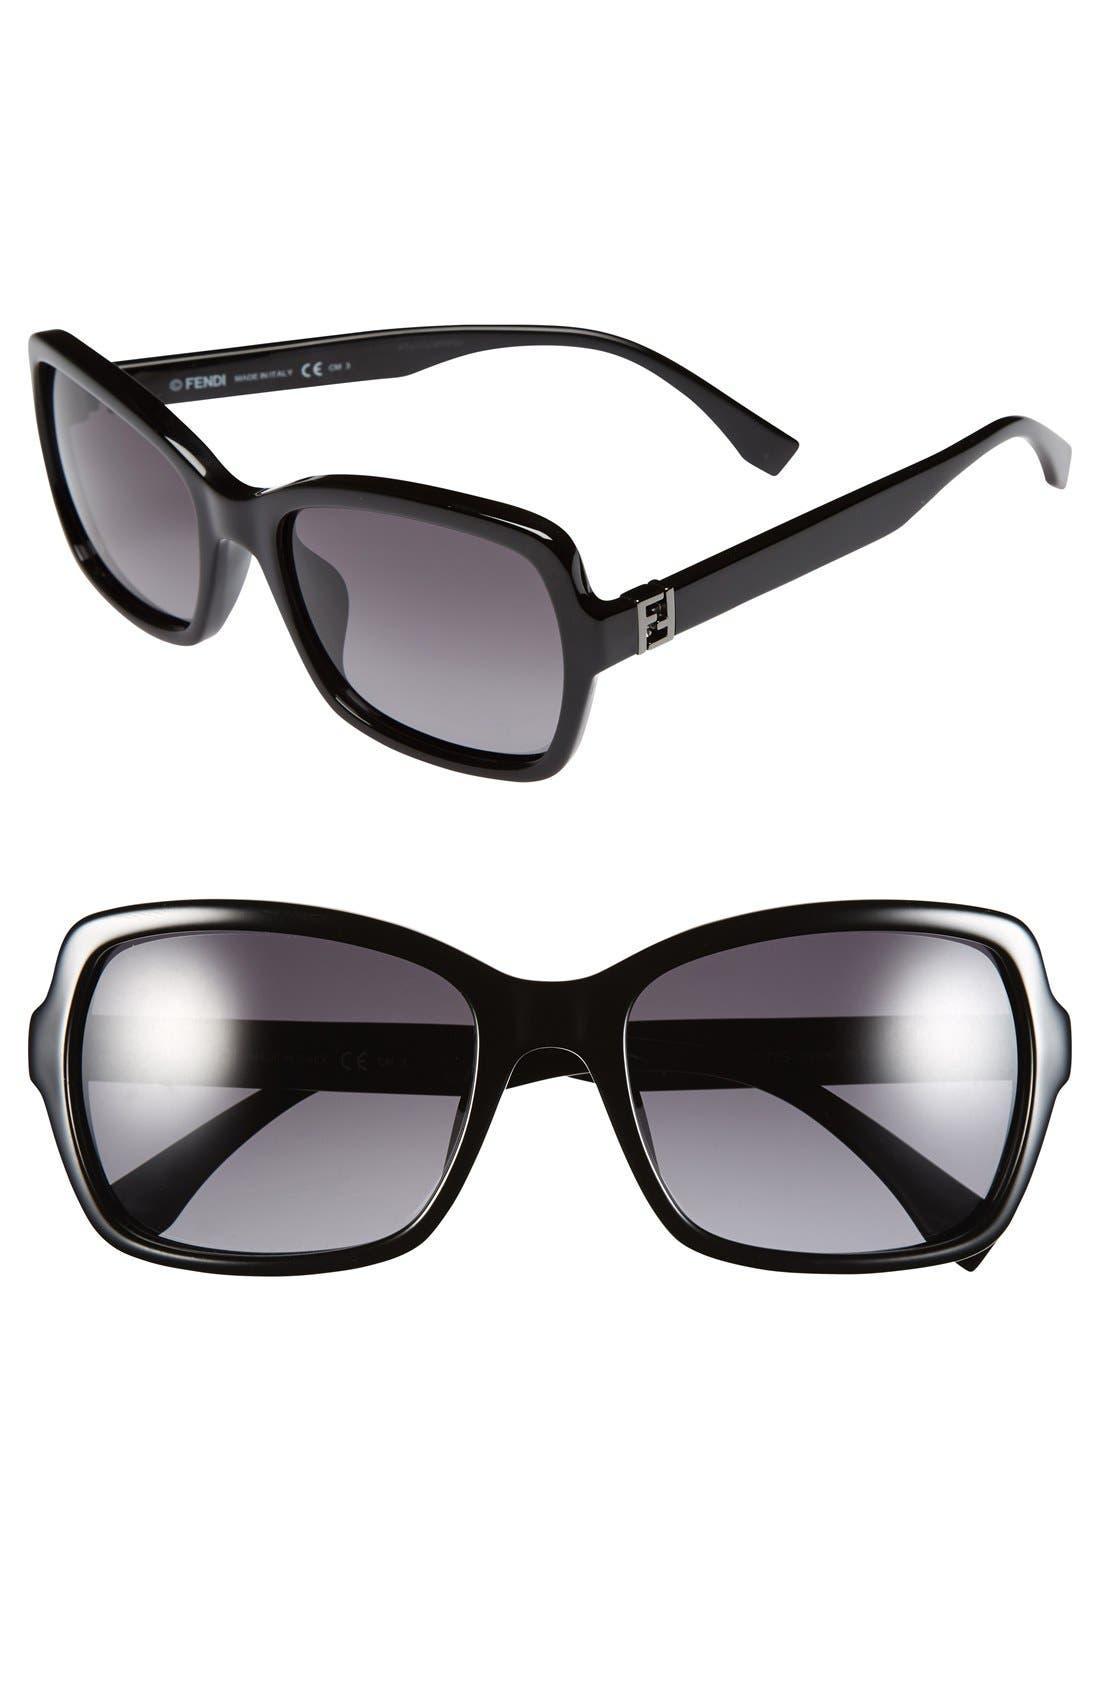 55mm Retro Sunglasses,                             Main thumbnail 1, color,                             001